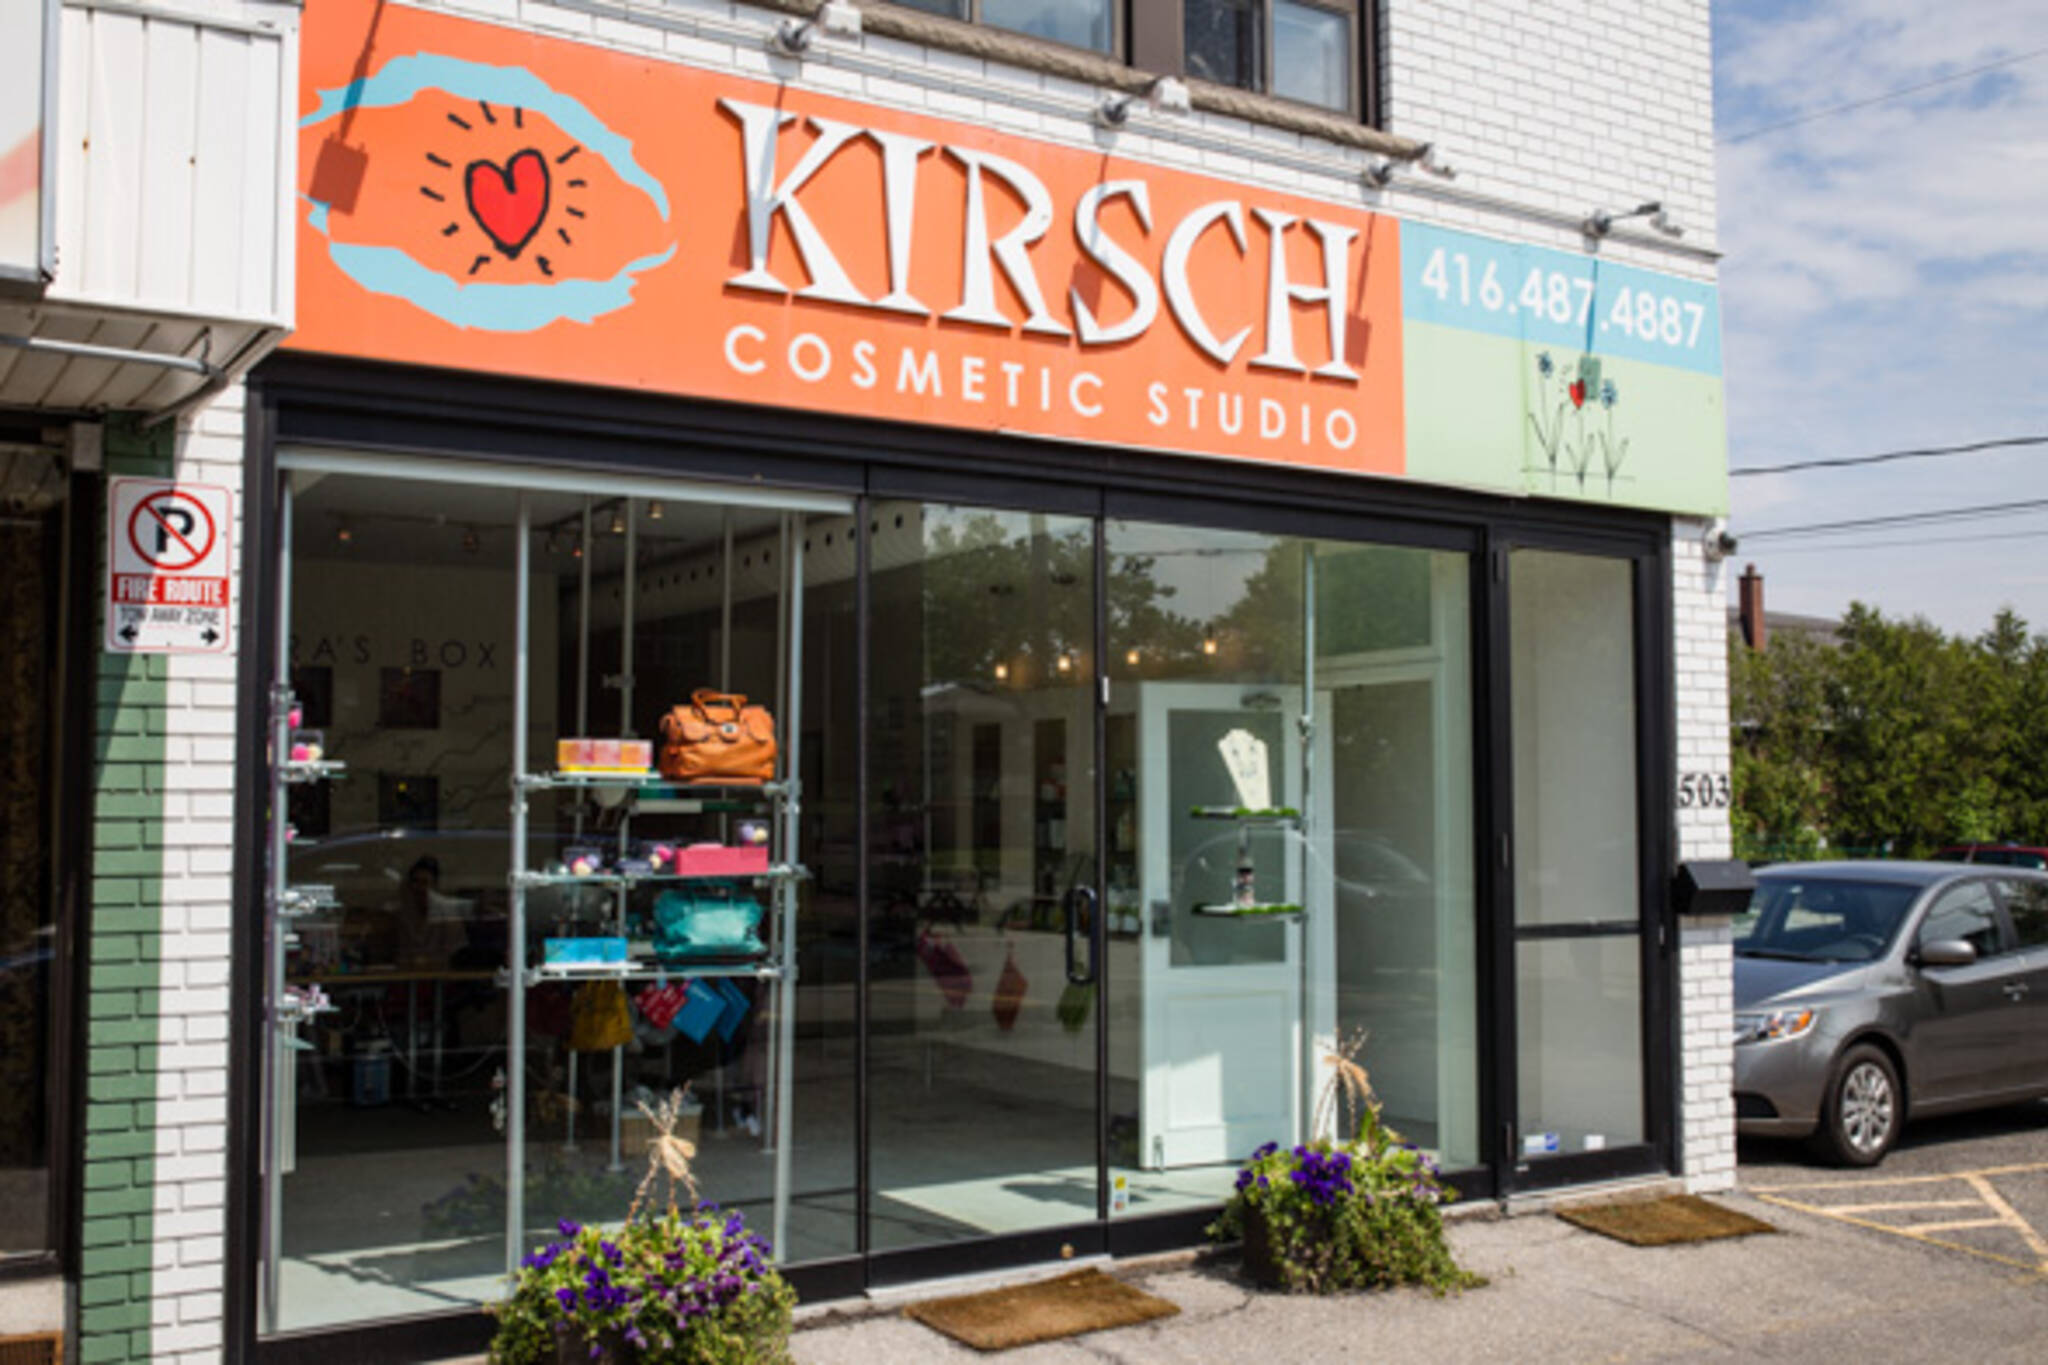 Kirsch Cosmetic Studio Toronto